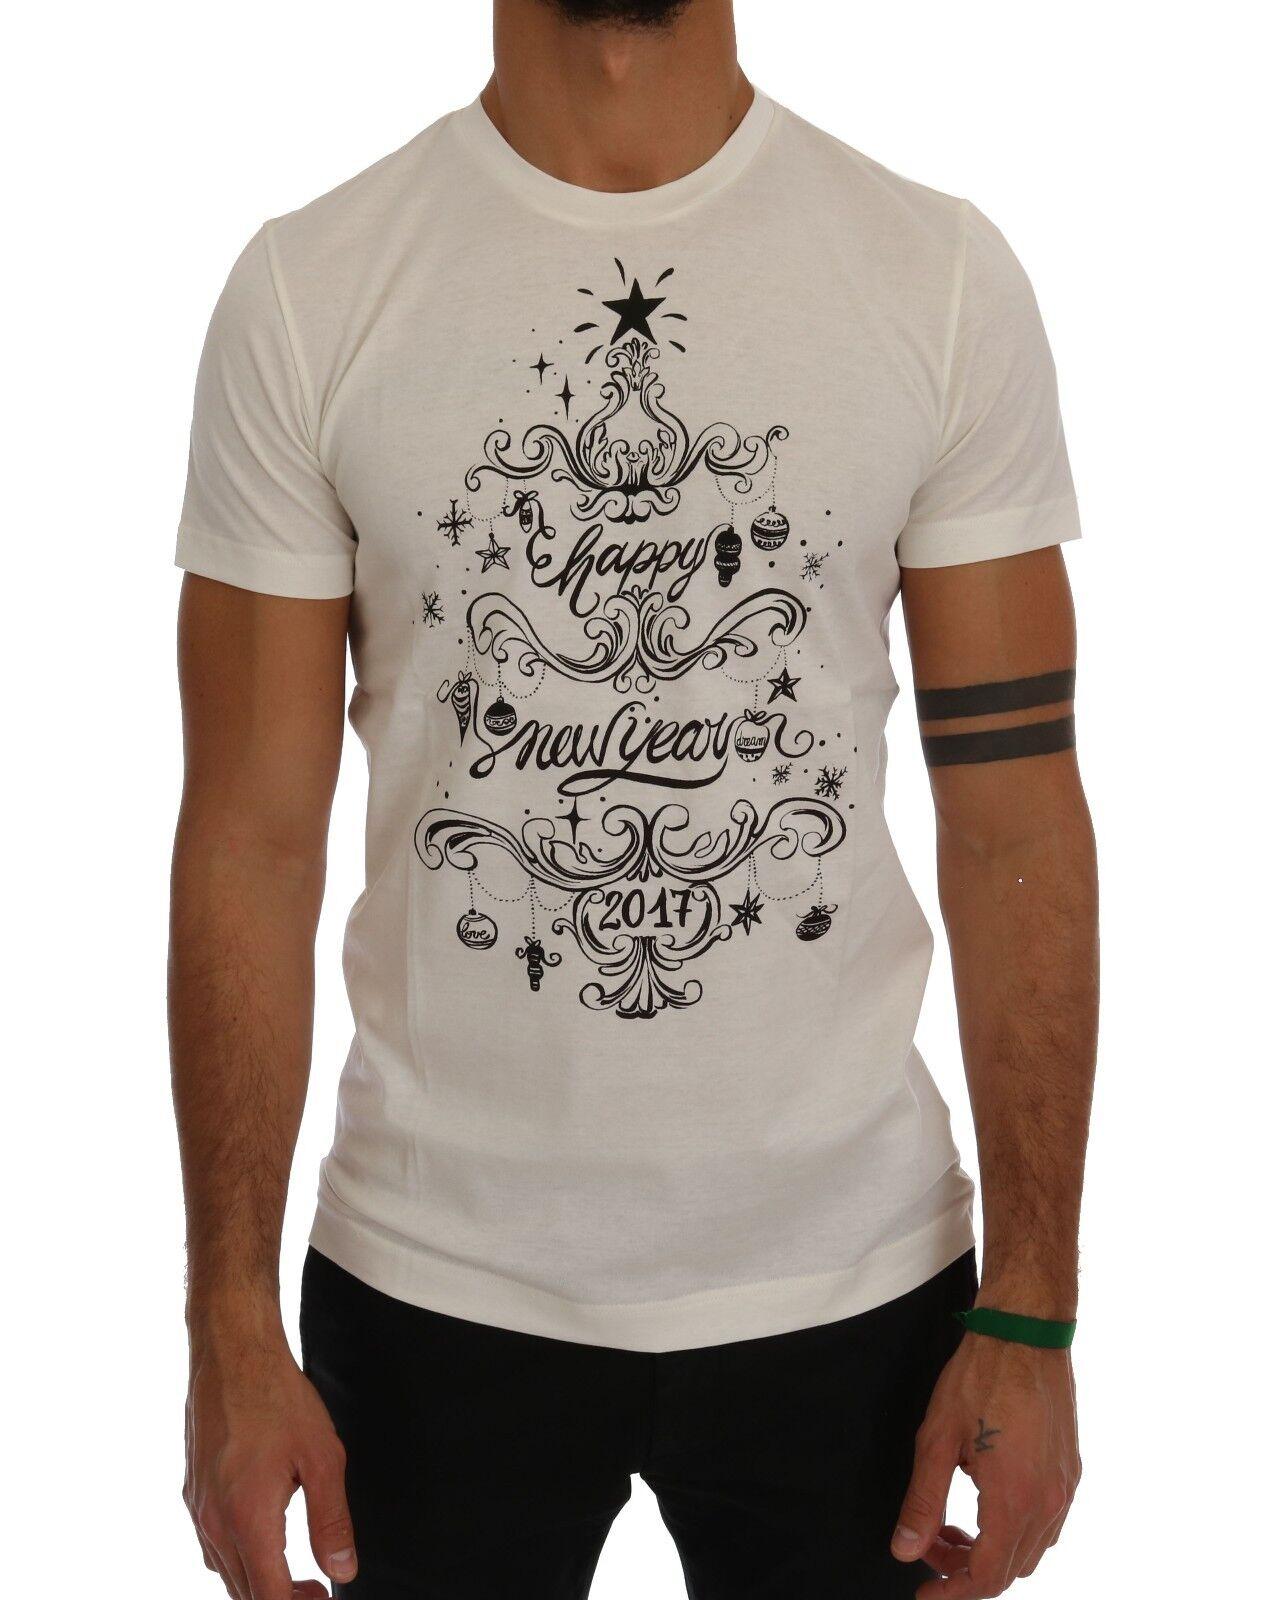 Nuevo Dolce & Gabbana Camiseta Cuello ROTondo 2017 Motive Impresión Algodón